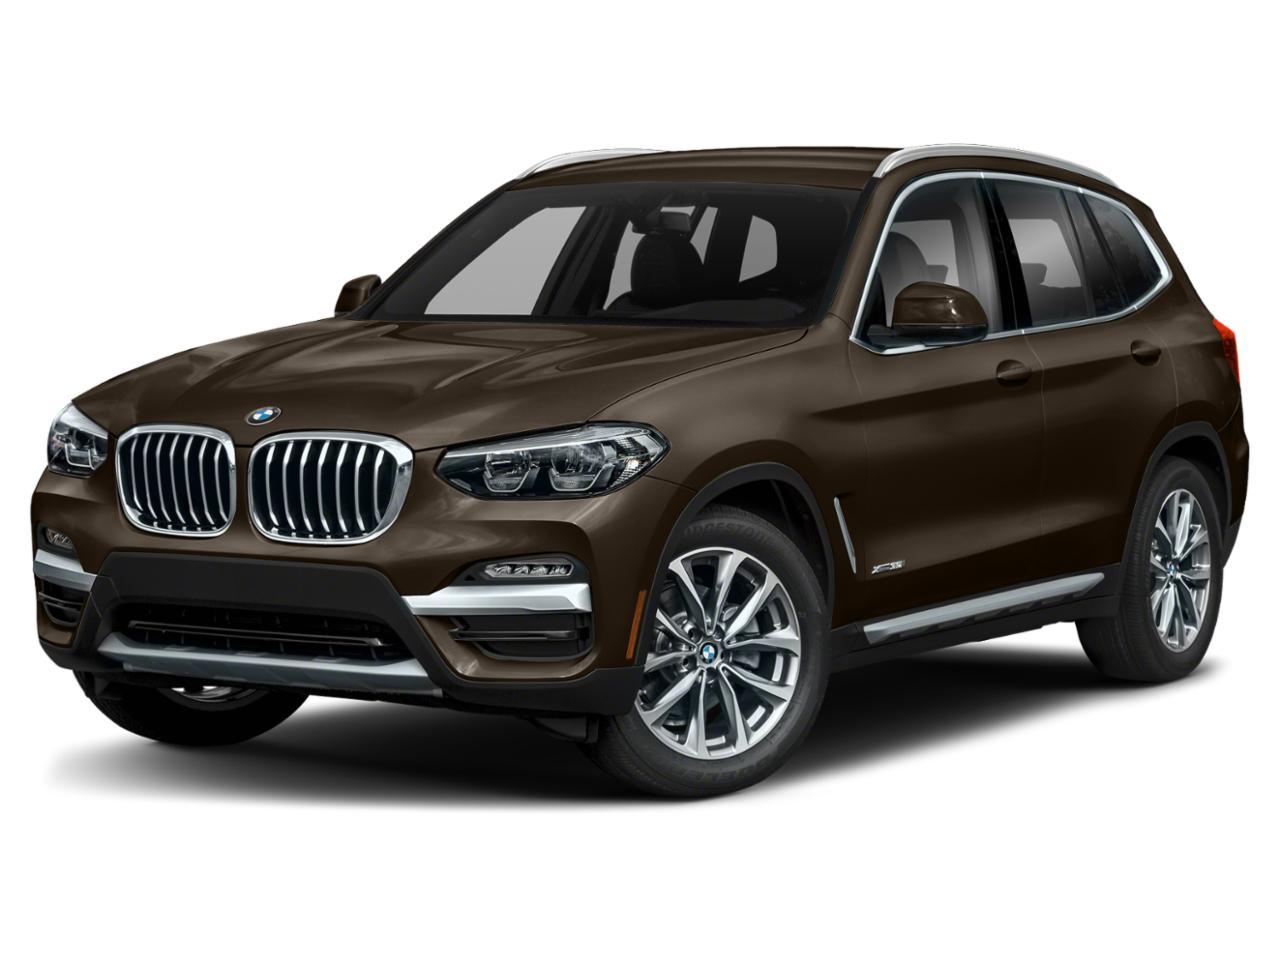 2020 BMW X3 sDrive30i Vehicle Photo in Grapevine, TX 76051